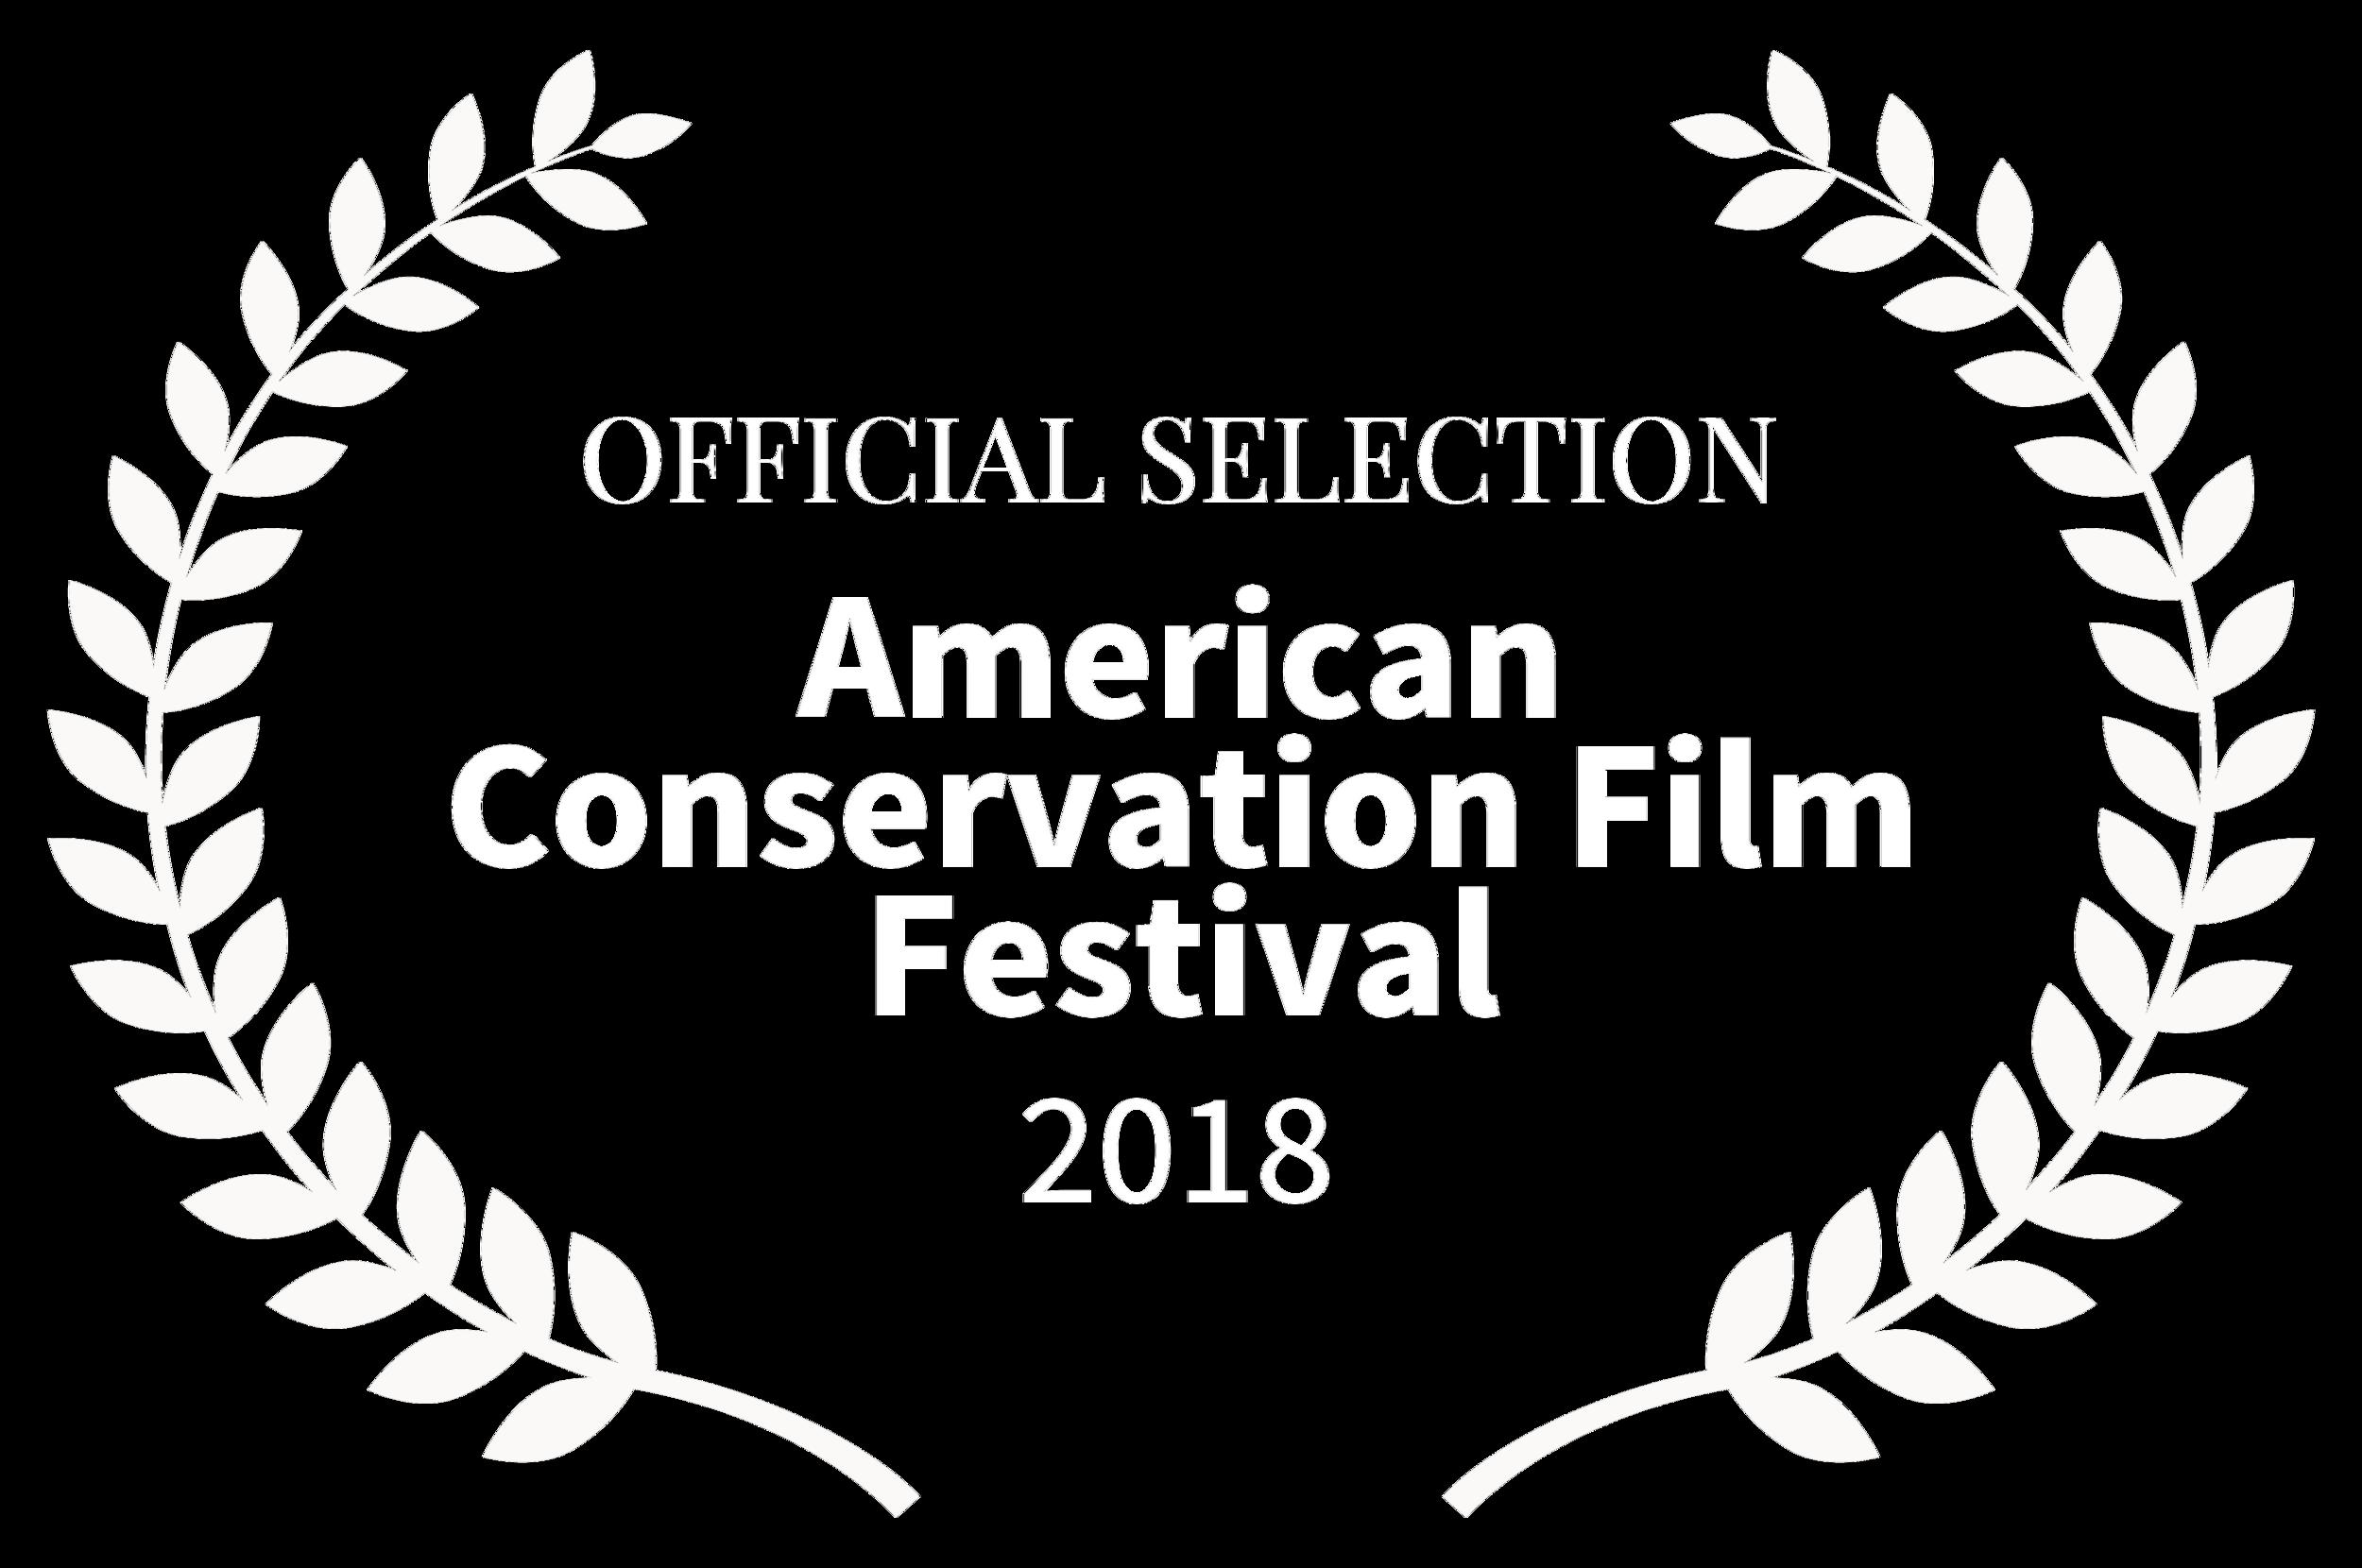 2018_AmericanConservationFF_WhiteLaurels copy.png